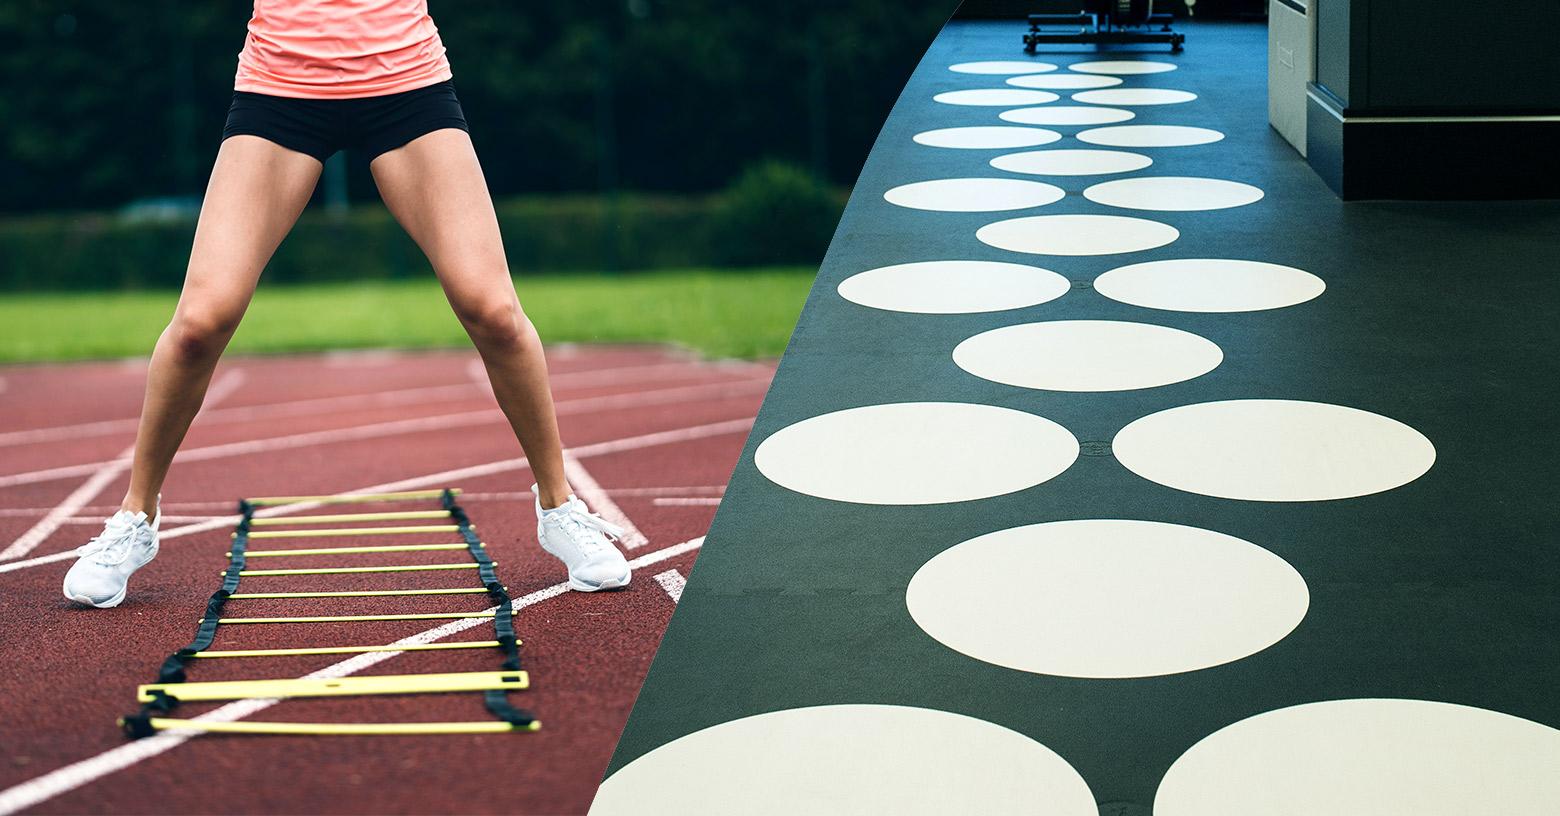 Speed ladders & hopscotch / Koordinationsleiter & Hüpffelder